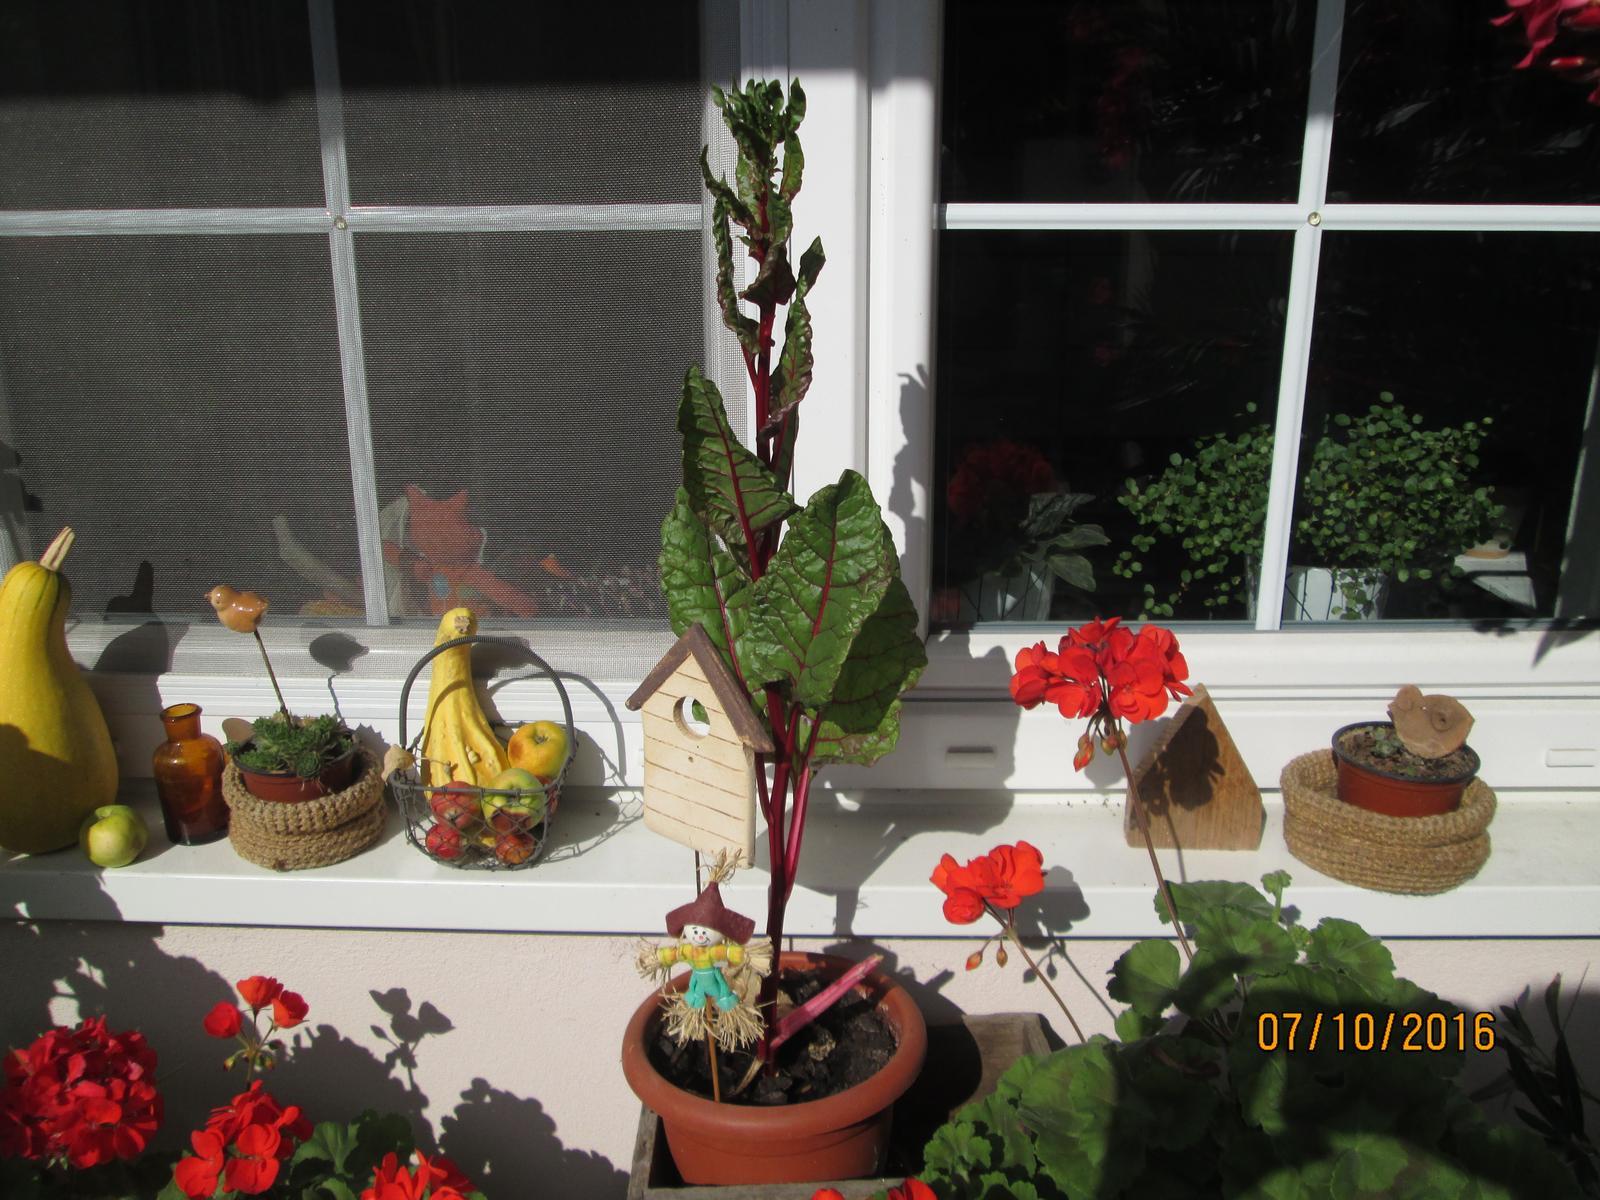 Moje zahrada - Obrázek č. 226